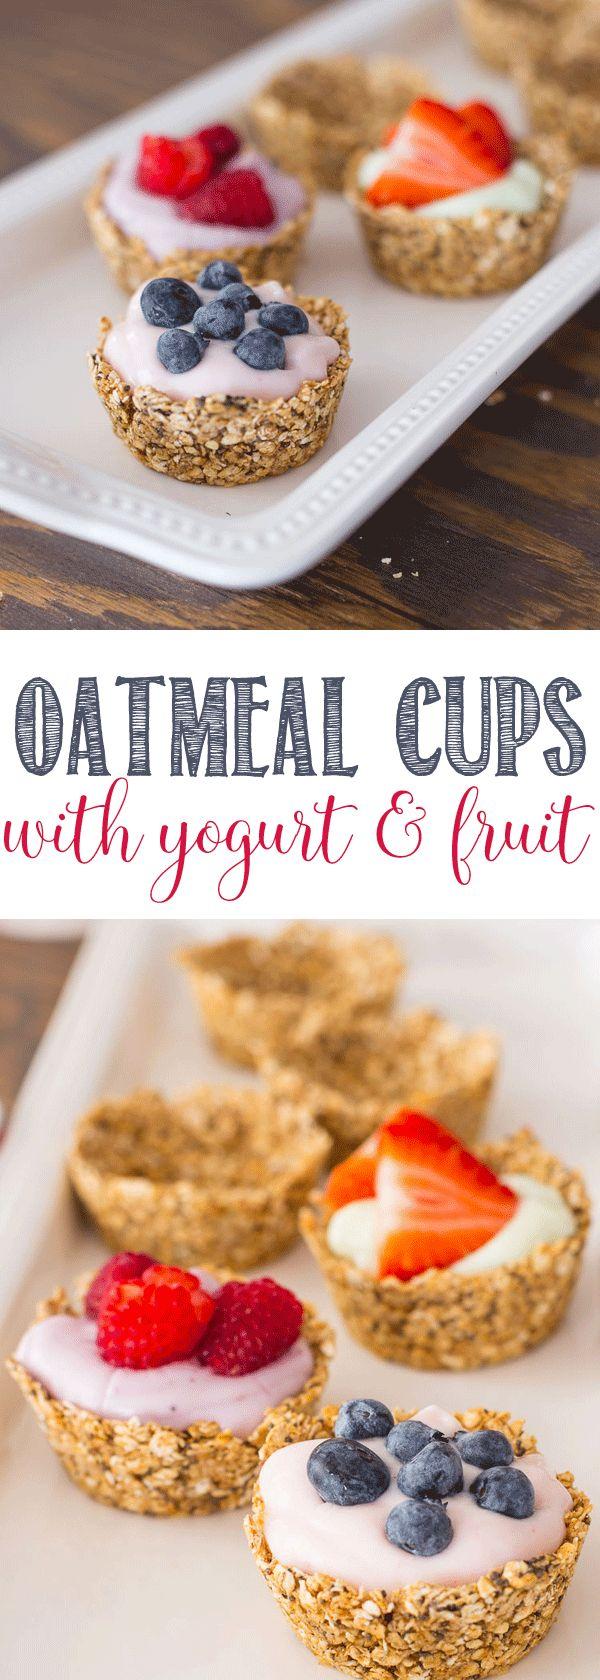 Oatmeal Cups with Yogurt and Fruit via @domesticallyspeaking